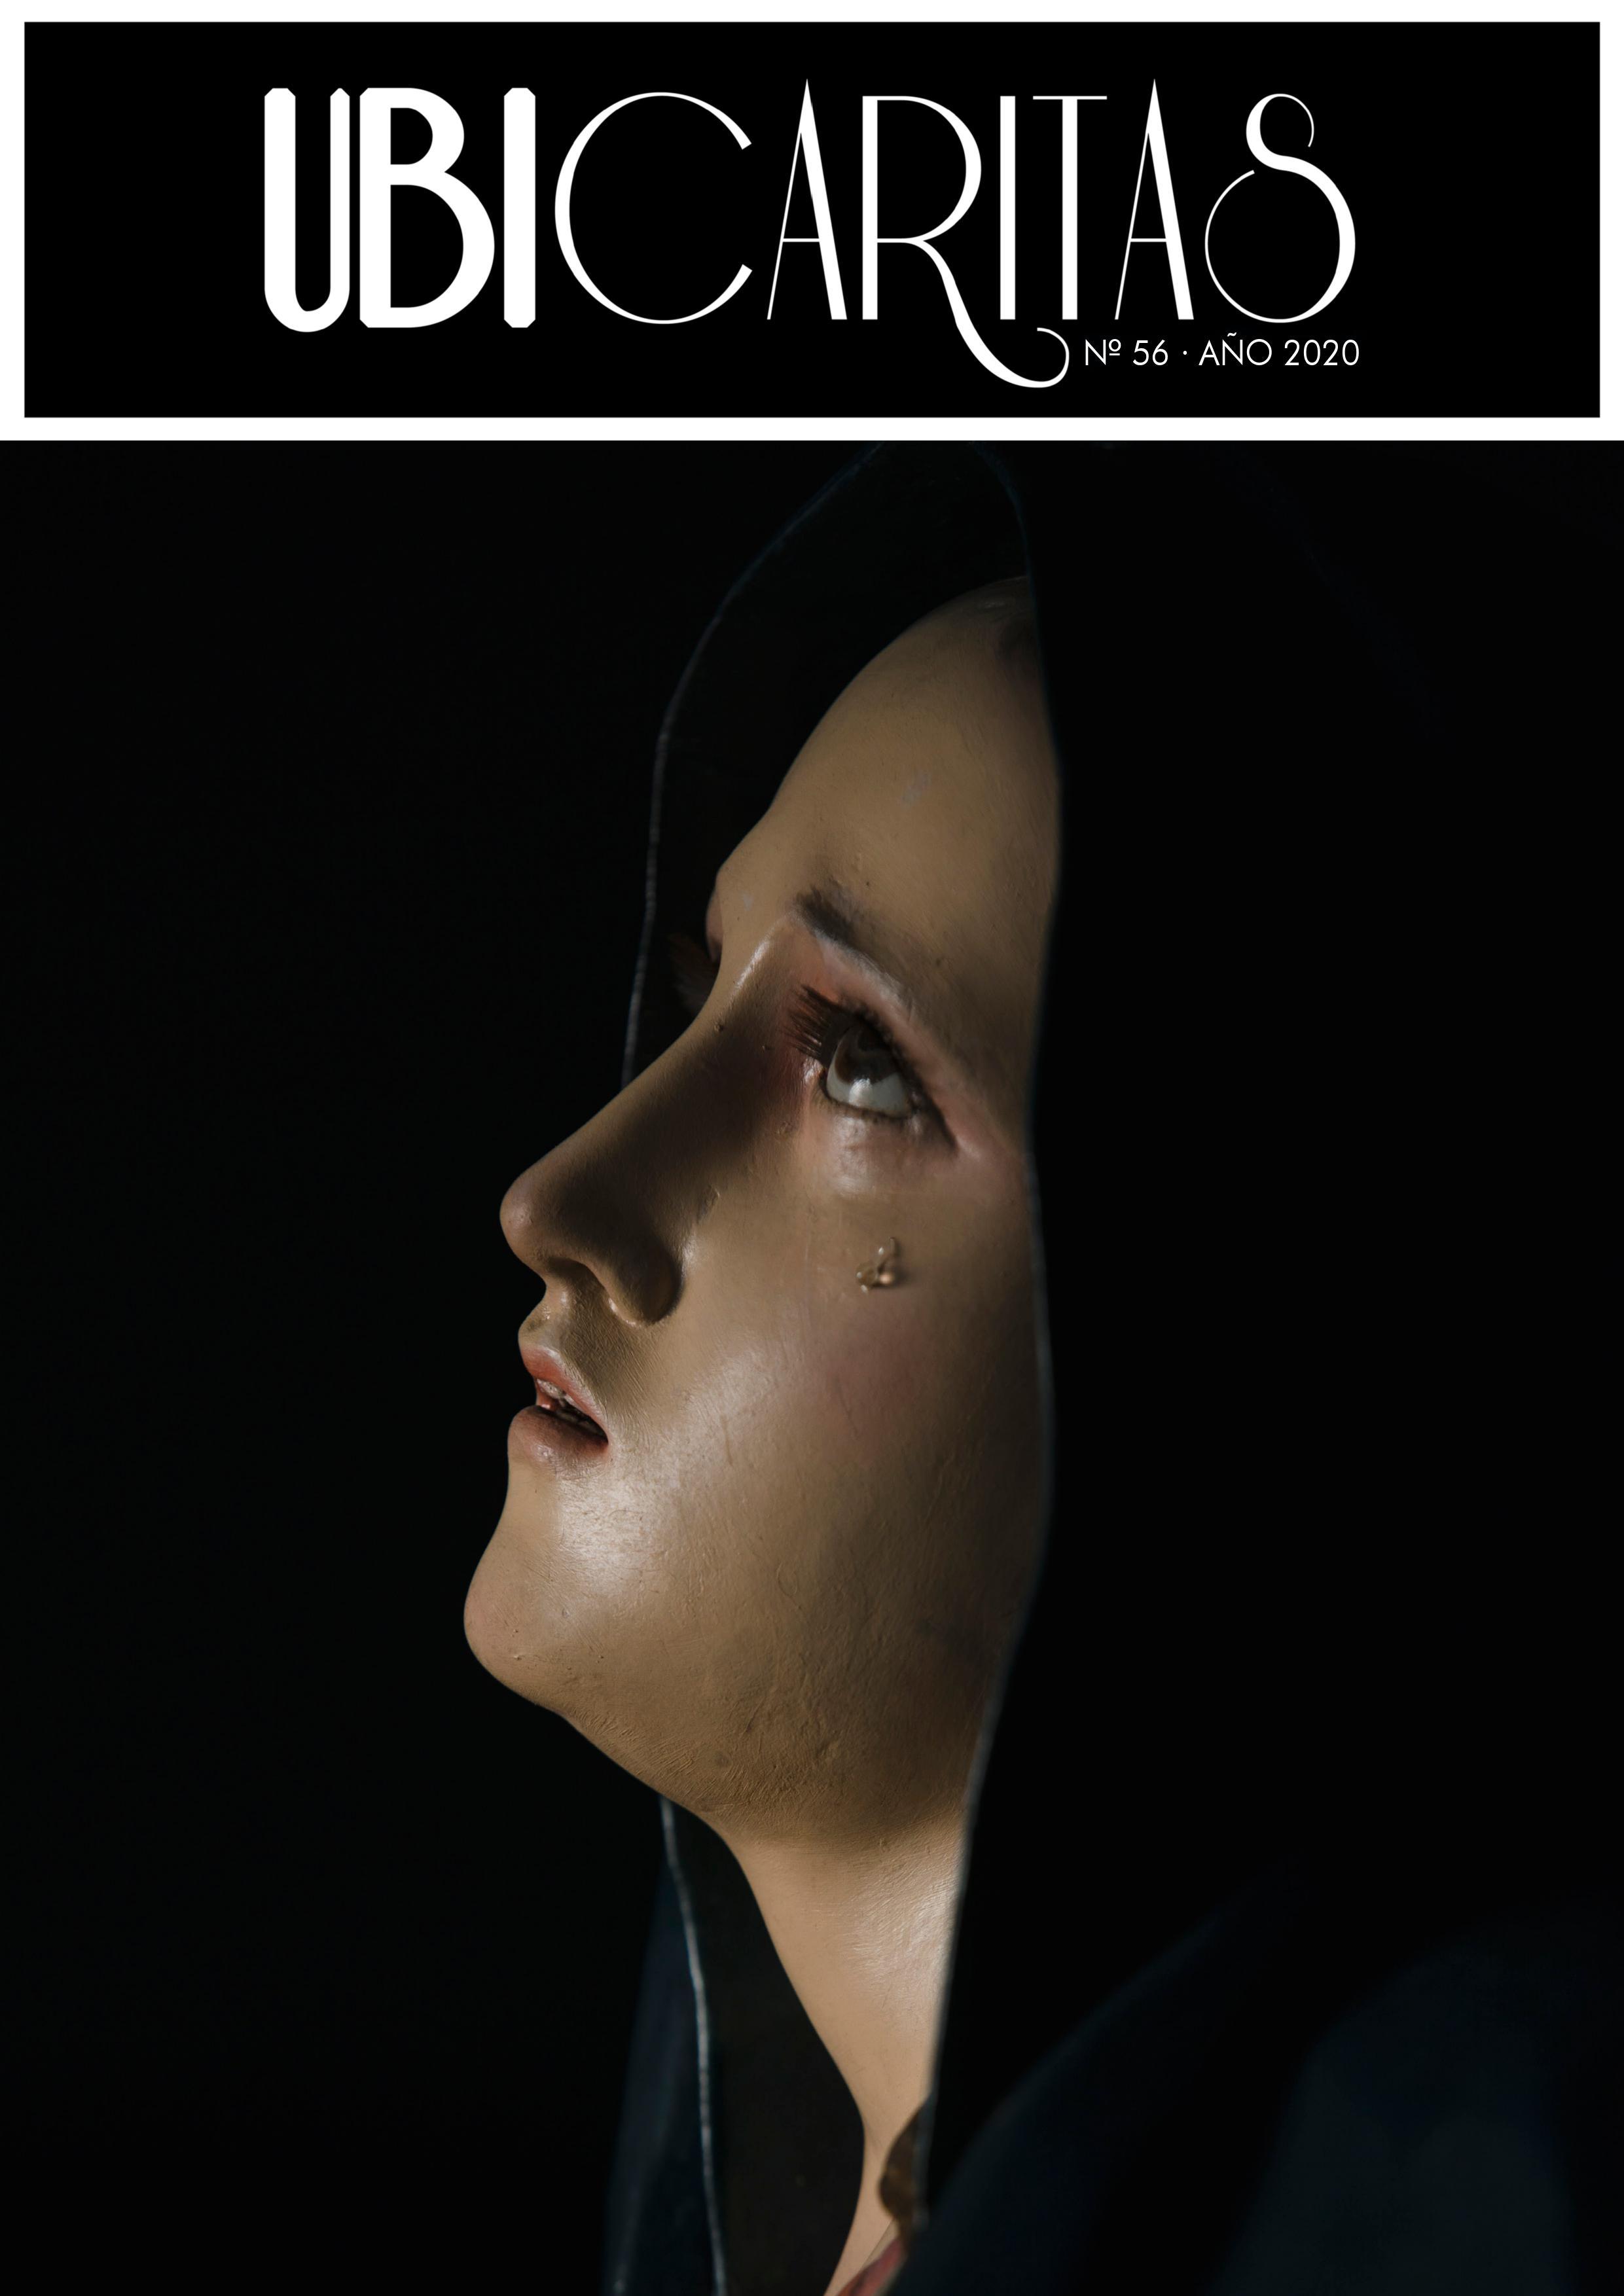 Boletín Ubi Caritas 2020